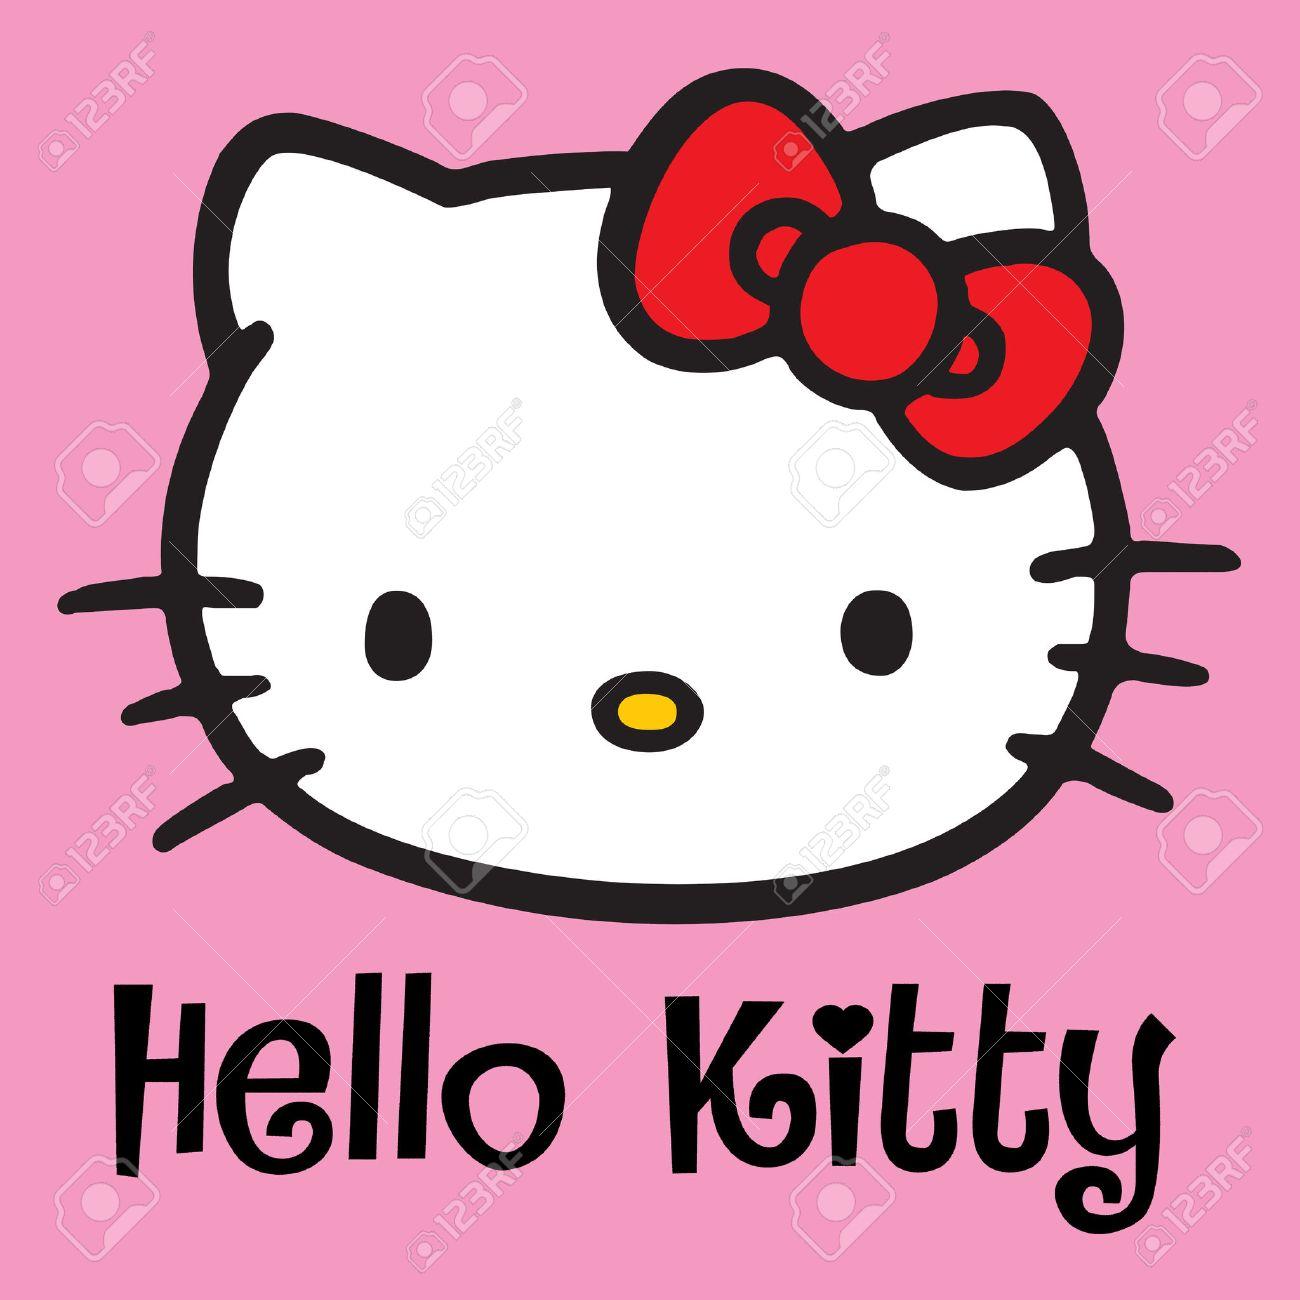 89+ Gambar Gambar Hello Kitty Paling Keren